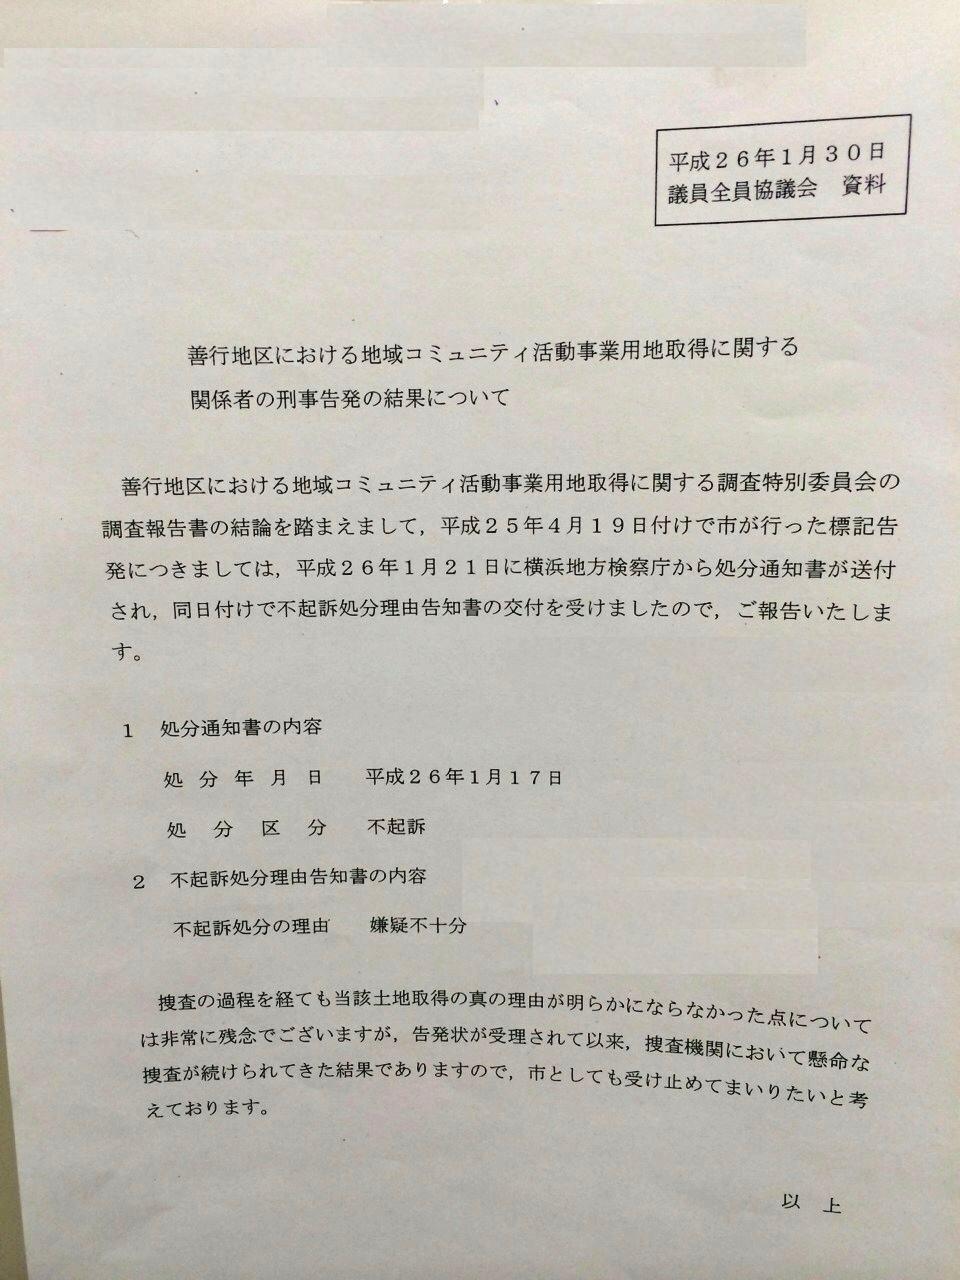 http://fujikama.coolblog.jp/2014/JAN/20140130.jpg